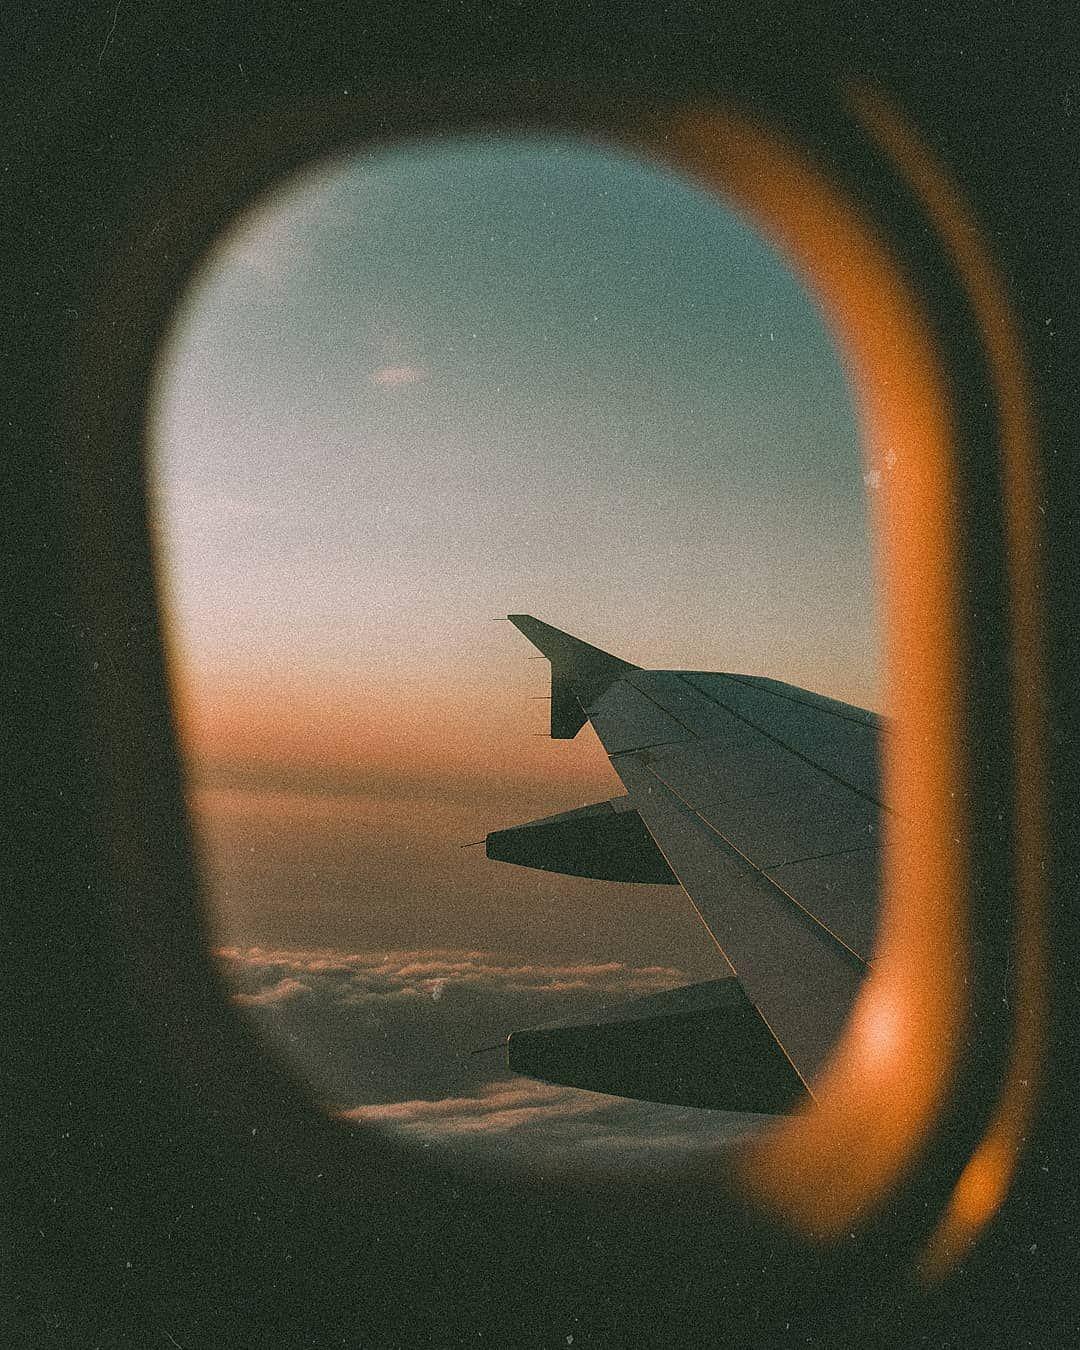 Sky Aesthetic Instagram Adventure Travel Traveling Vintage Airplane Tumblr Aesthetic Tumblr Sky Aesthetic Sky Adventure Rainbow Photography